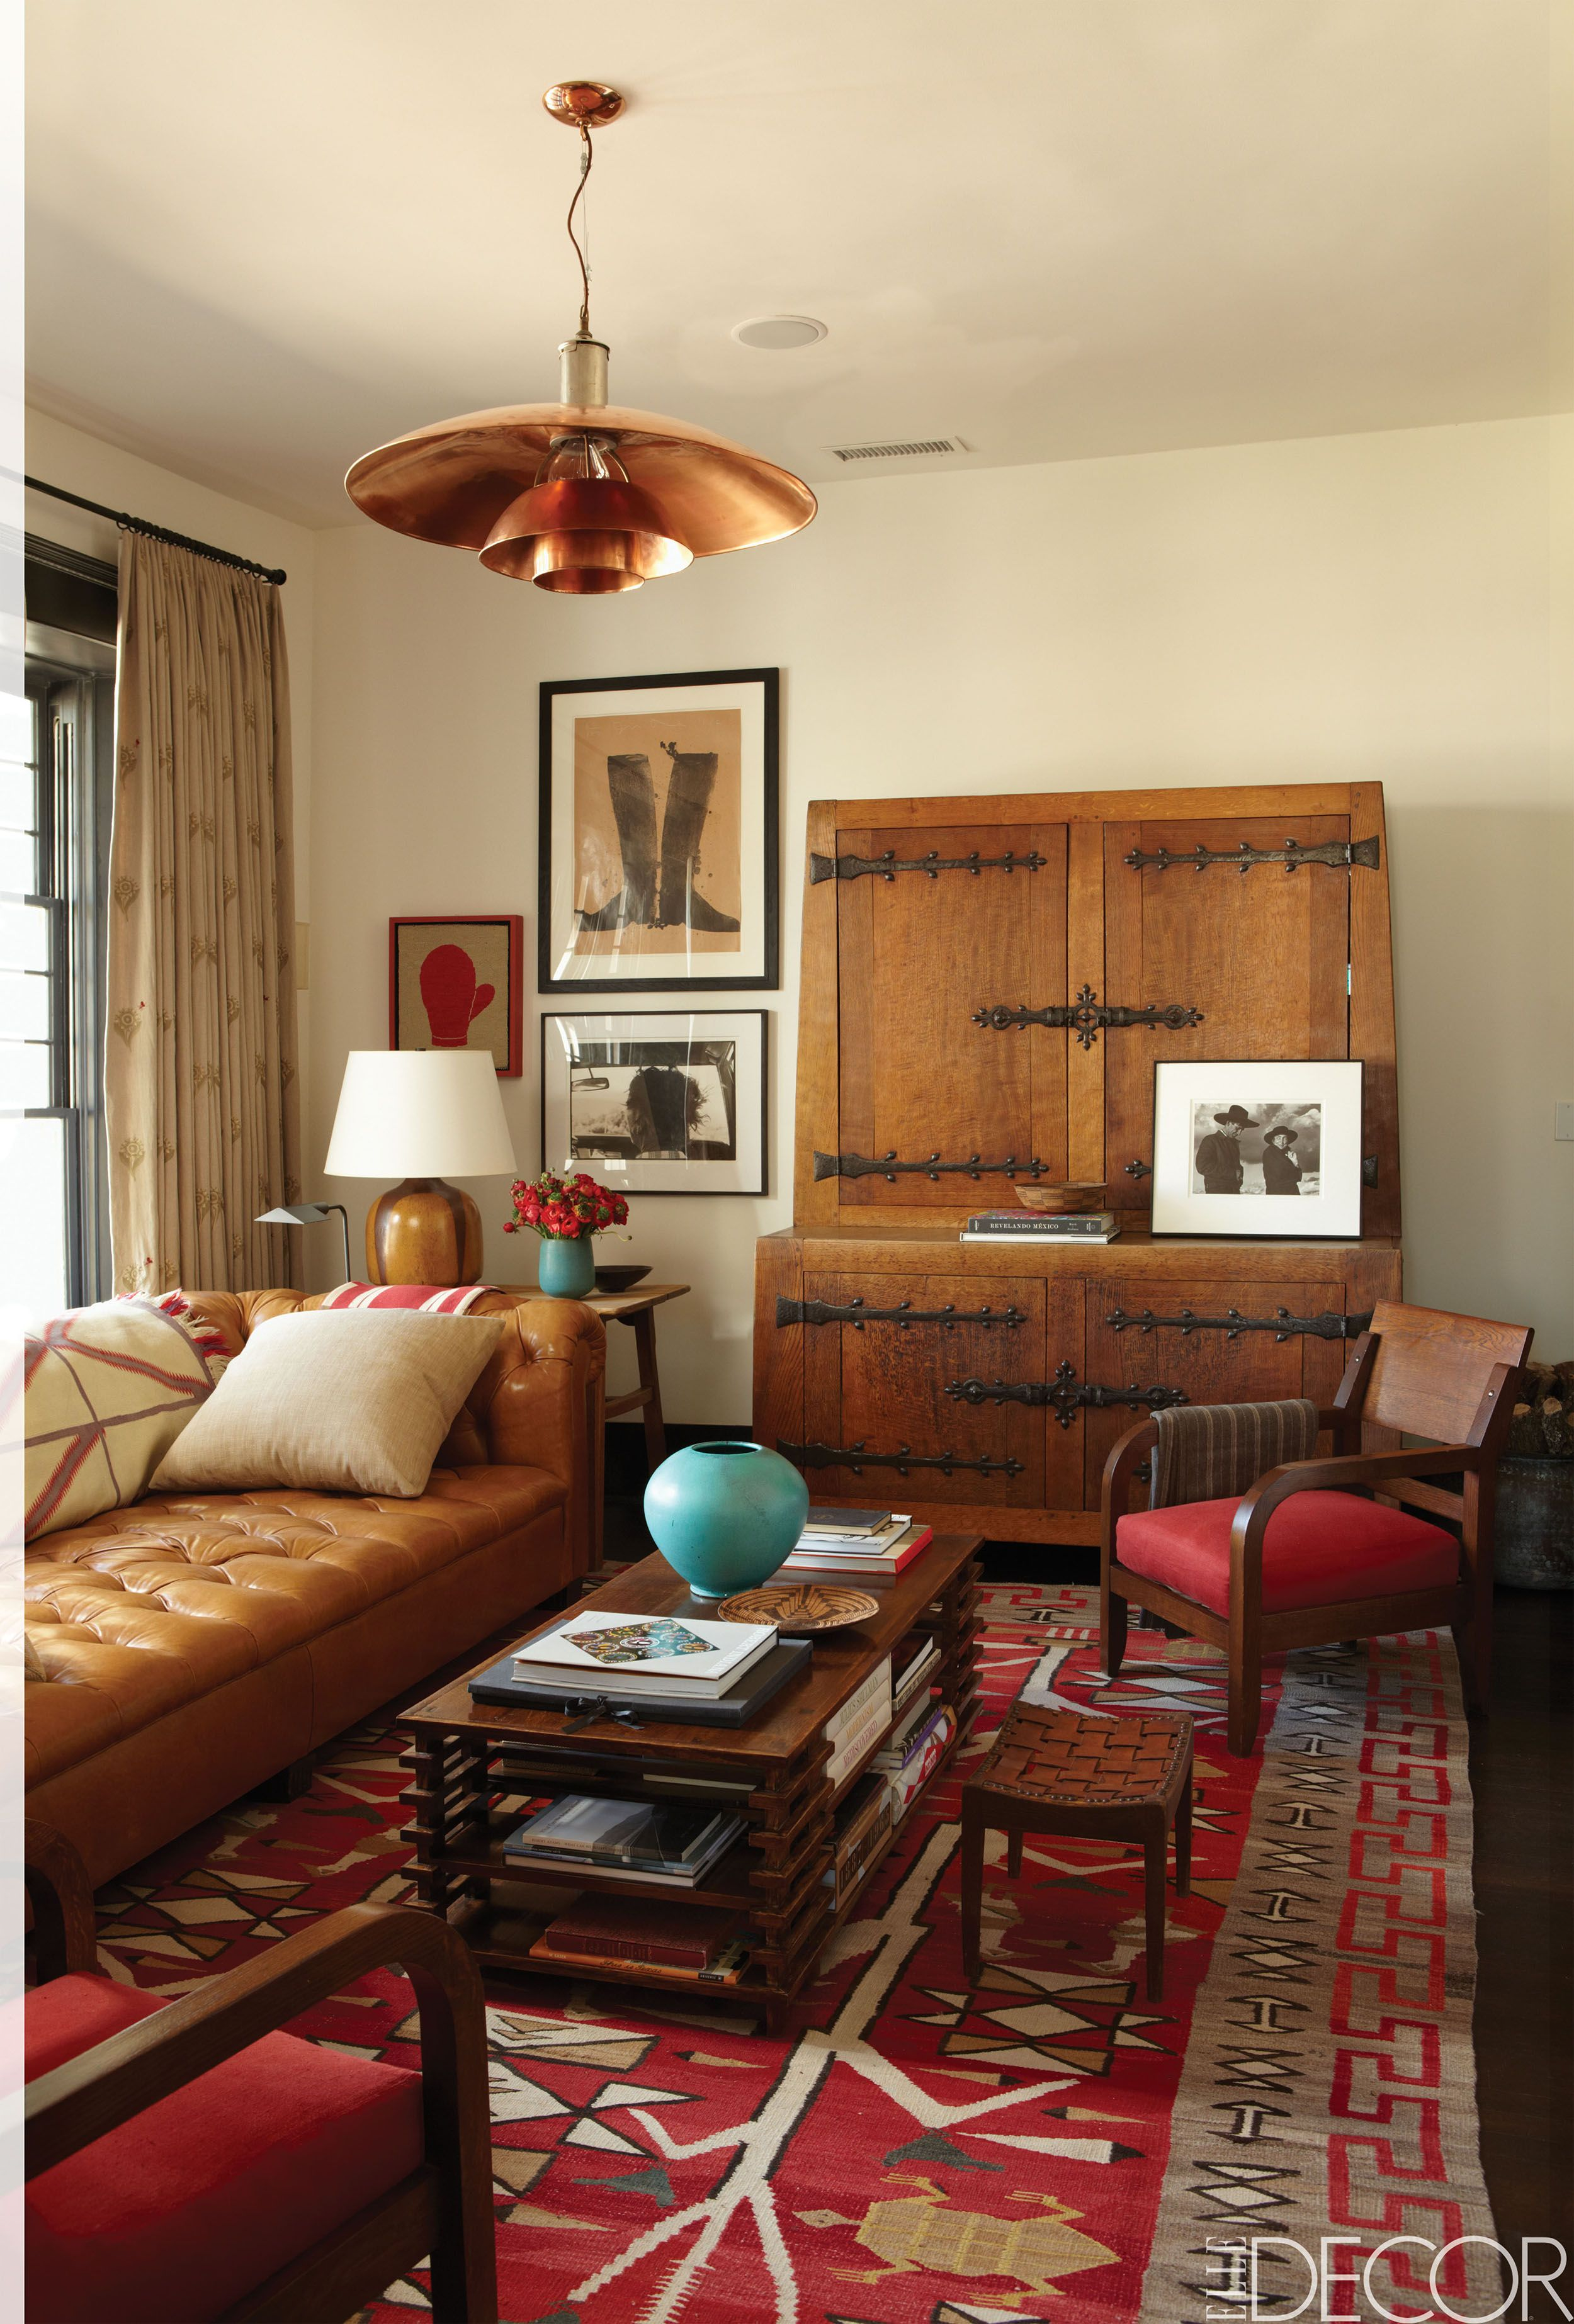 25 Summer House Design Ideas – Decor For Summer Homes